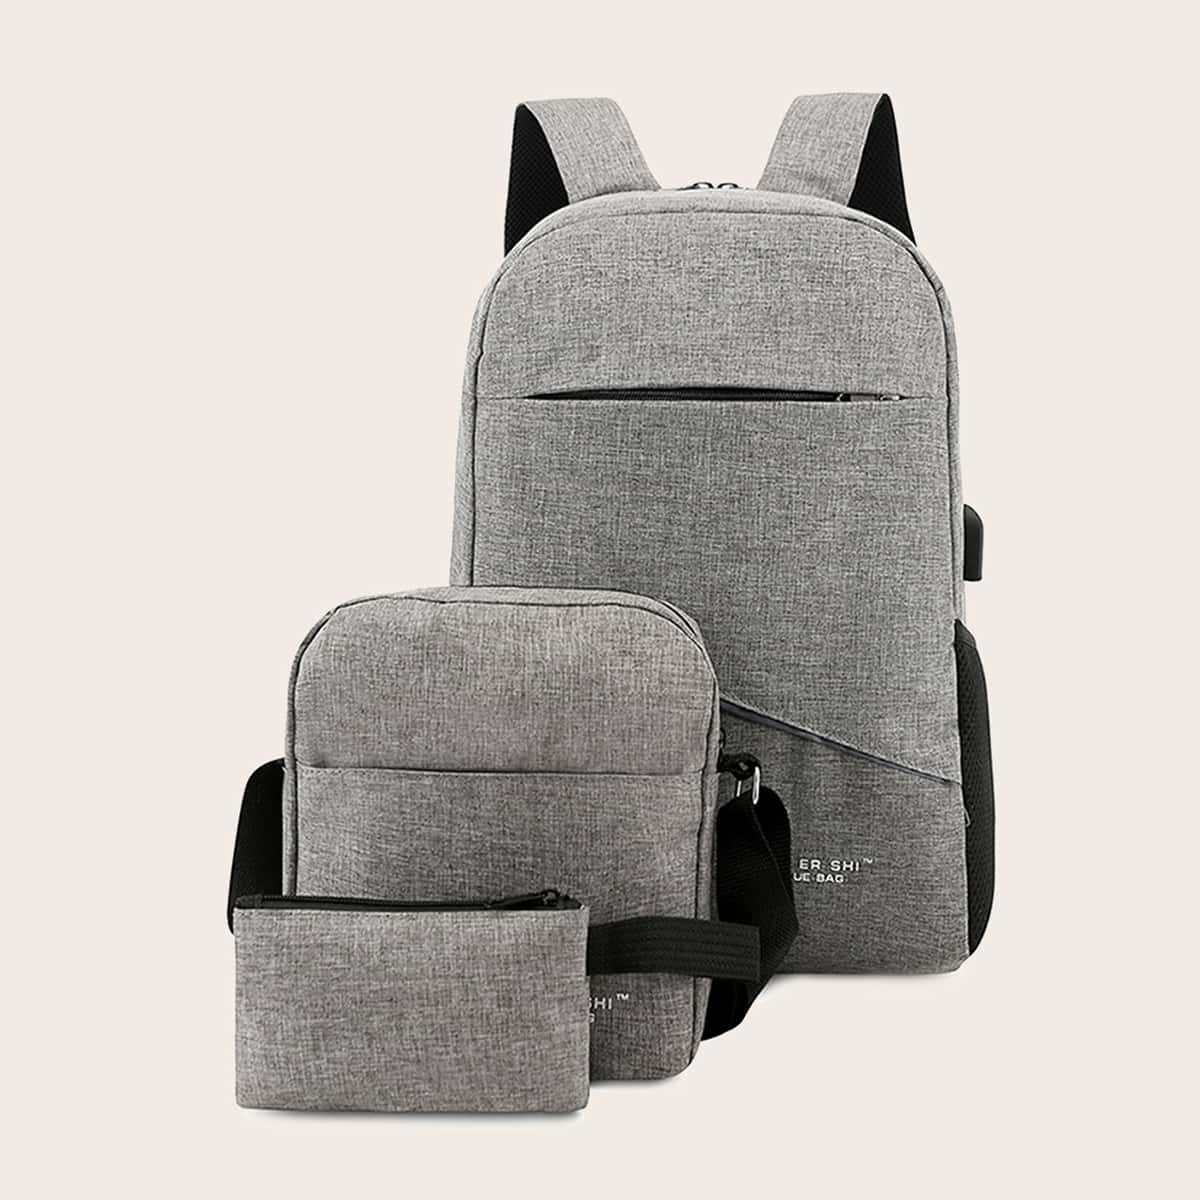 3шт минималистский рюкзак и сумка через плечо